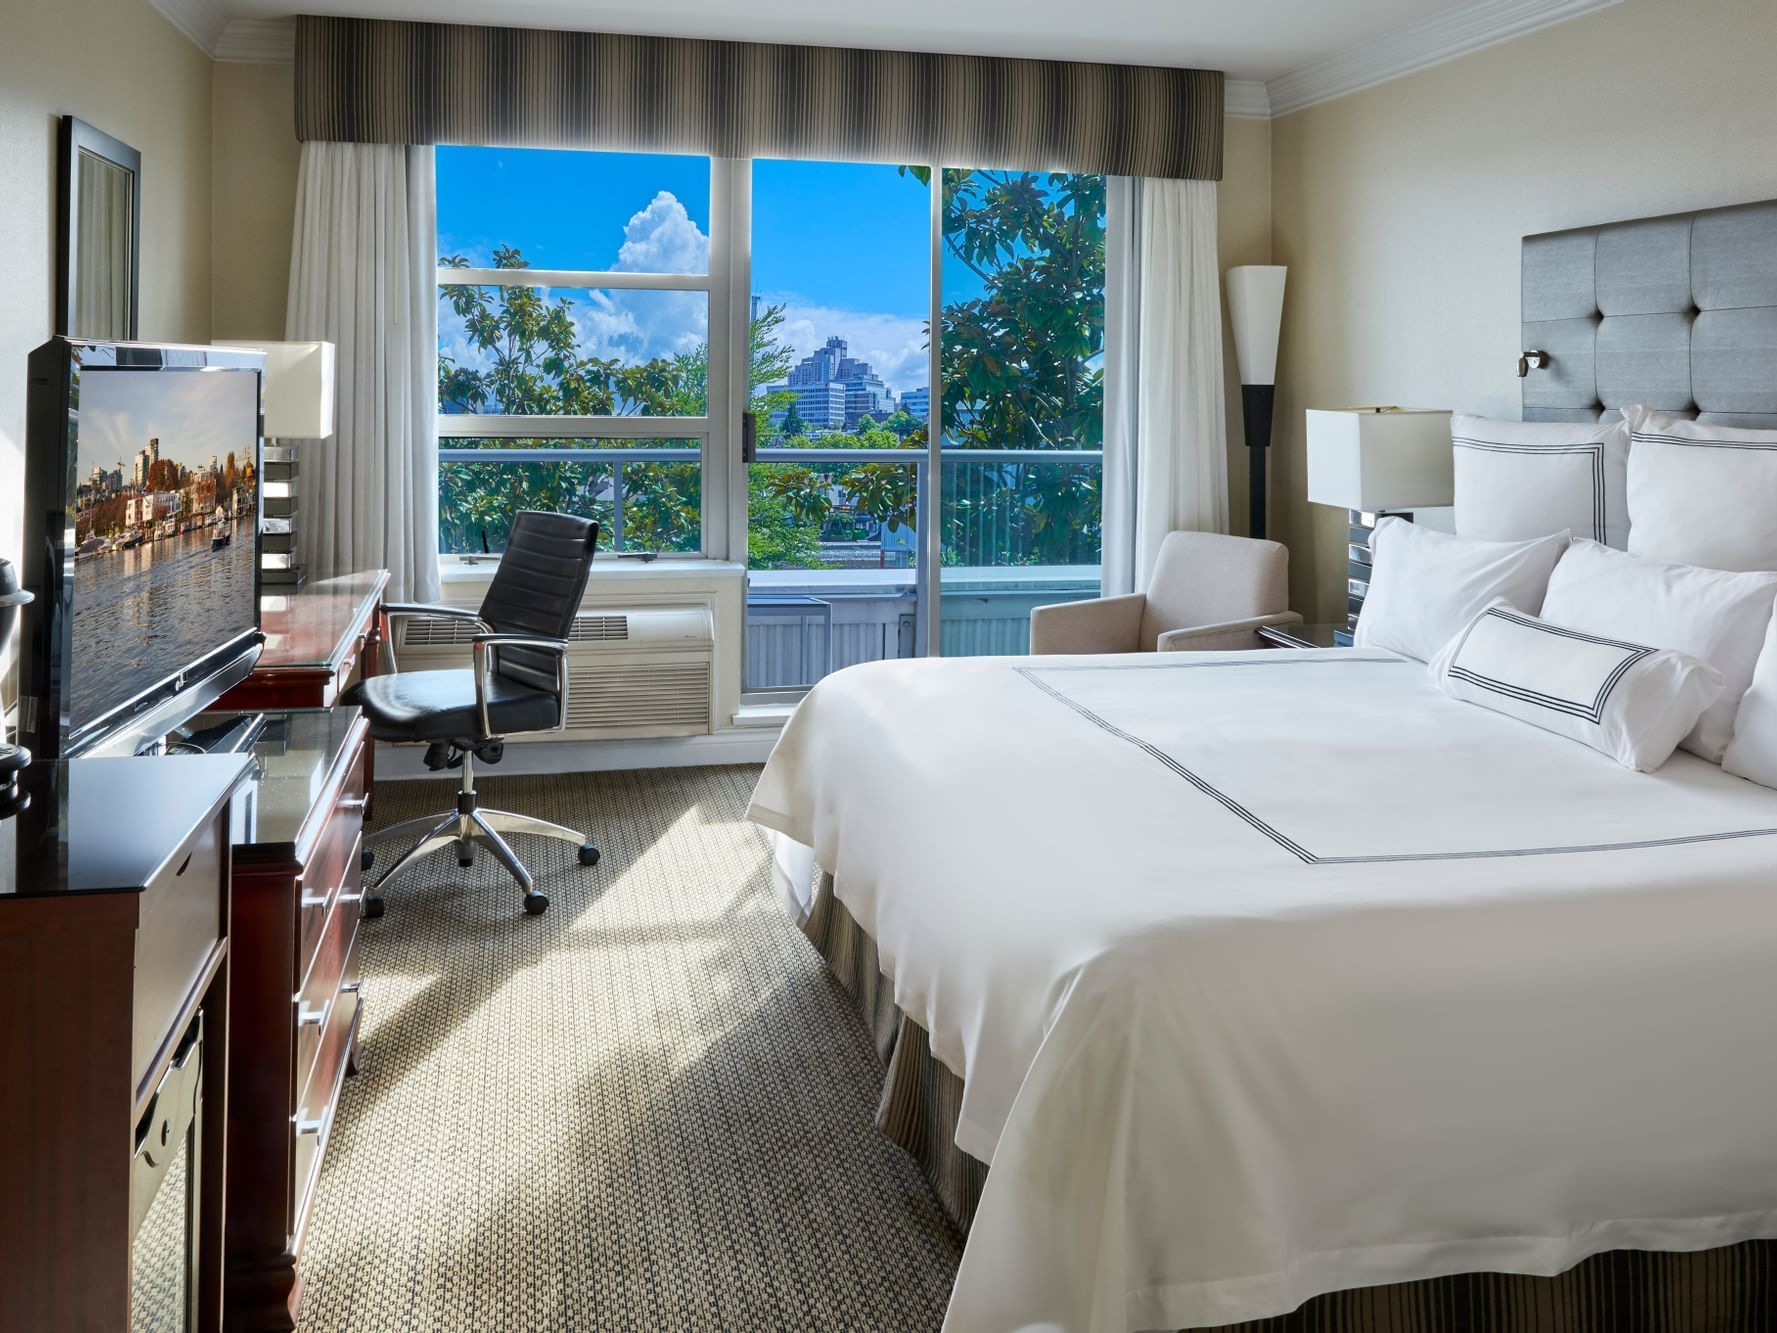 The Premium Balcony King bedroom at Granville Island Hotel